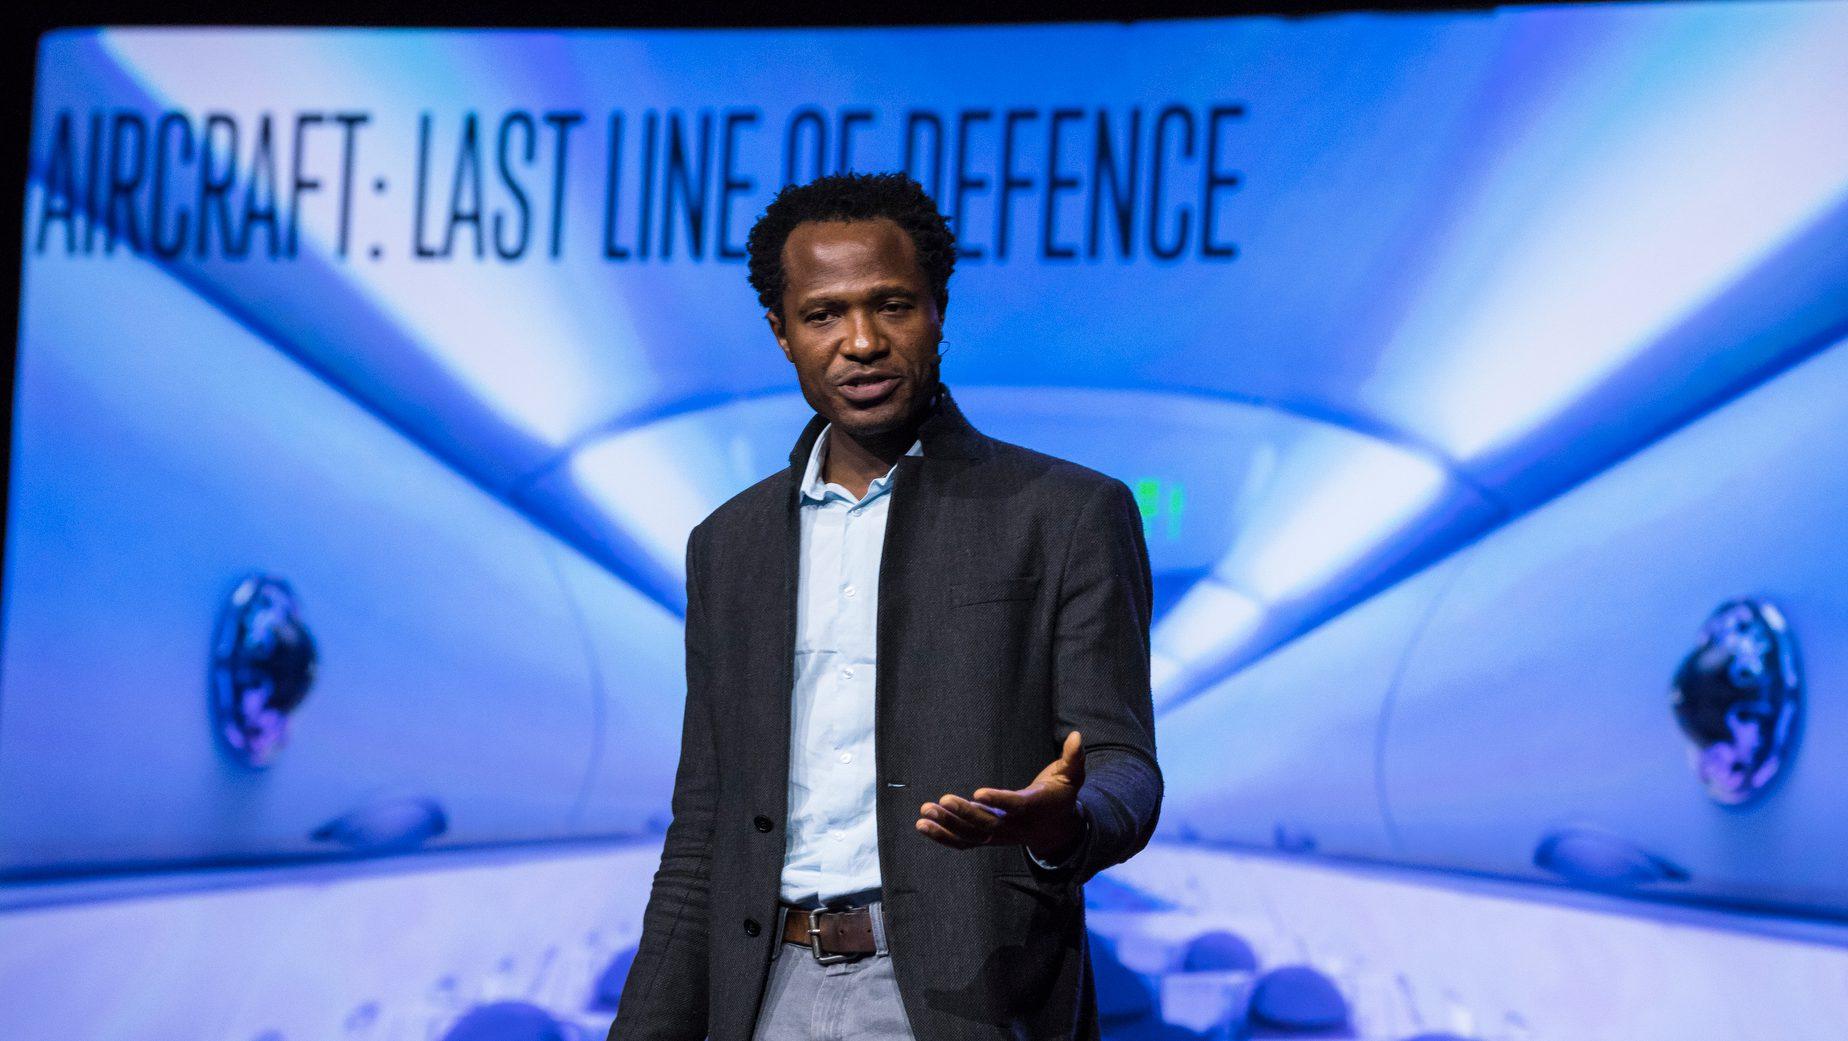 Oshiorenoya Agabi speaks at TEDGlobal 2017 - Builders, Truth Tellers, Catalysts - August 27-30, 2017, Arusha, Tanzania. Photo: